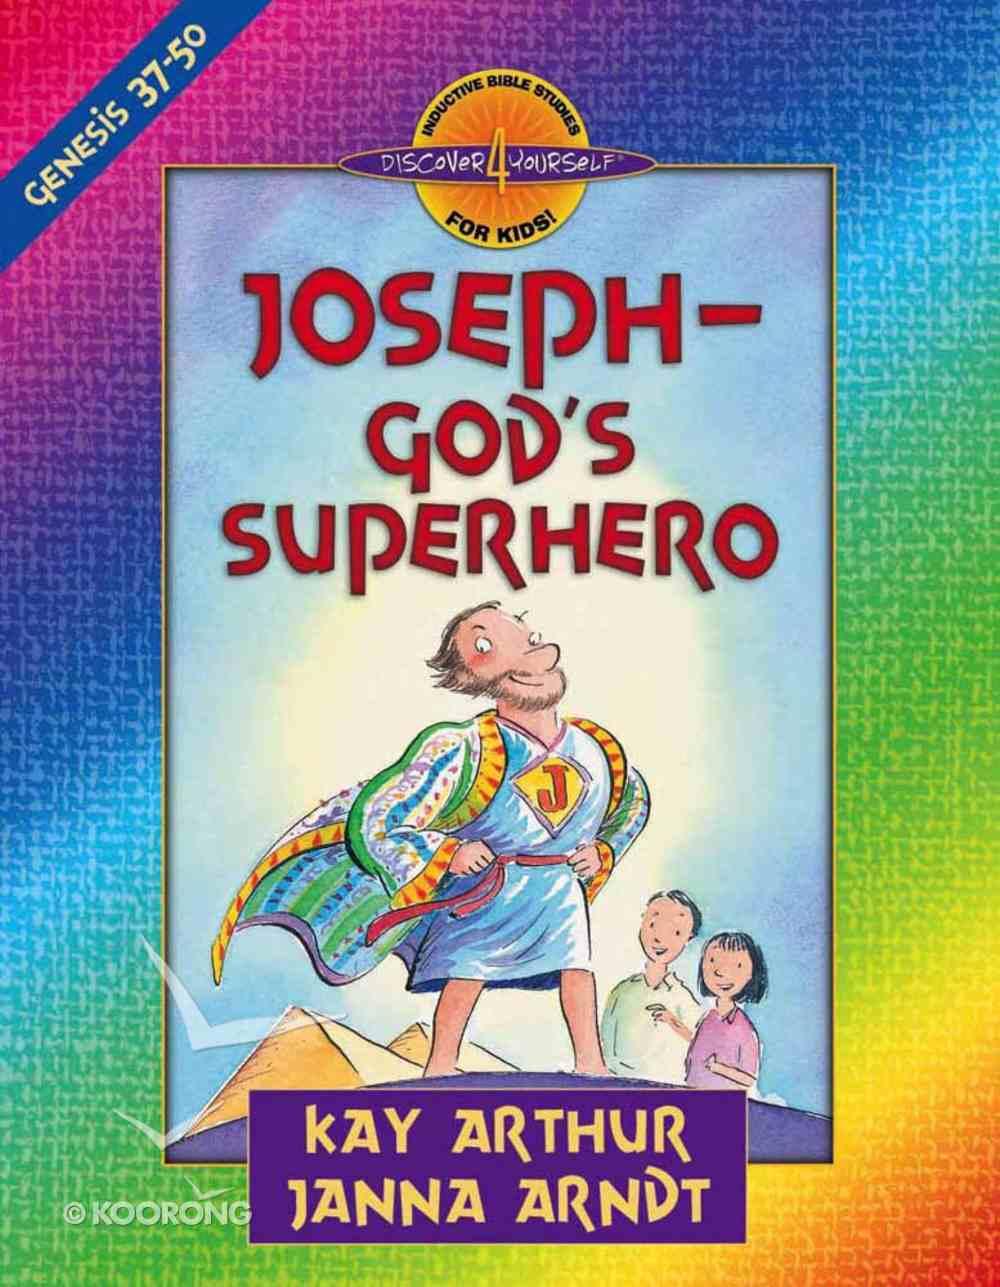 Joseph - God's Superhero (Genesis 37-50) (Discover For Yourself Bible Studies Series) Paperback